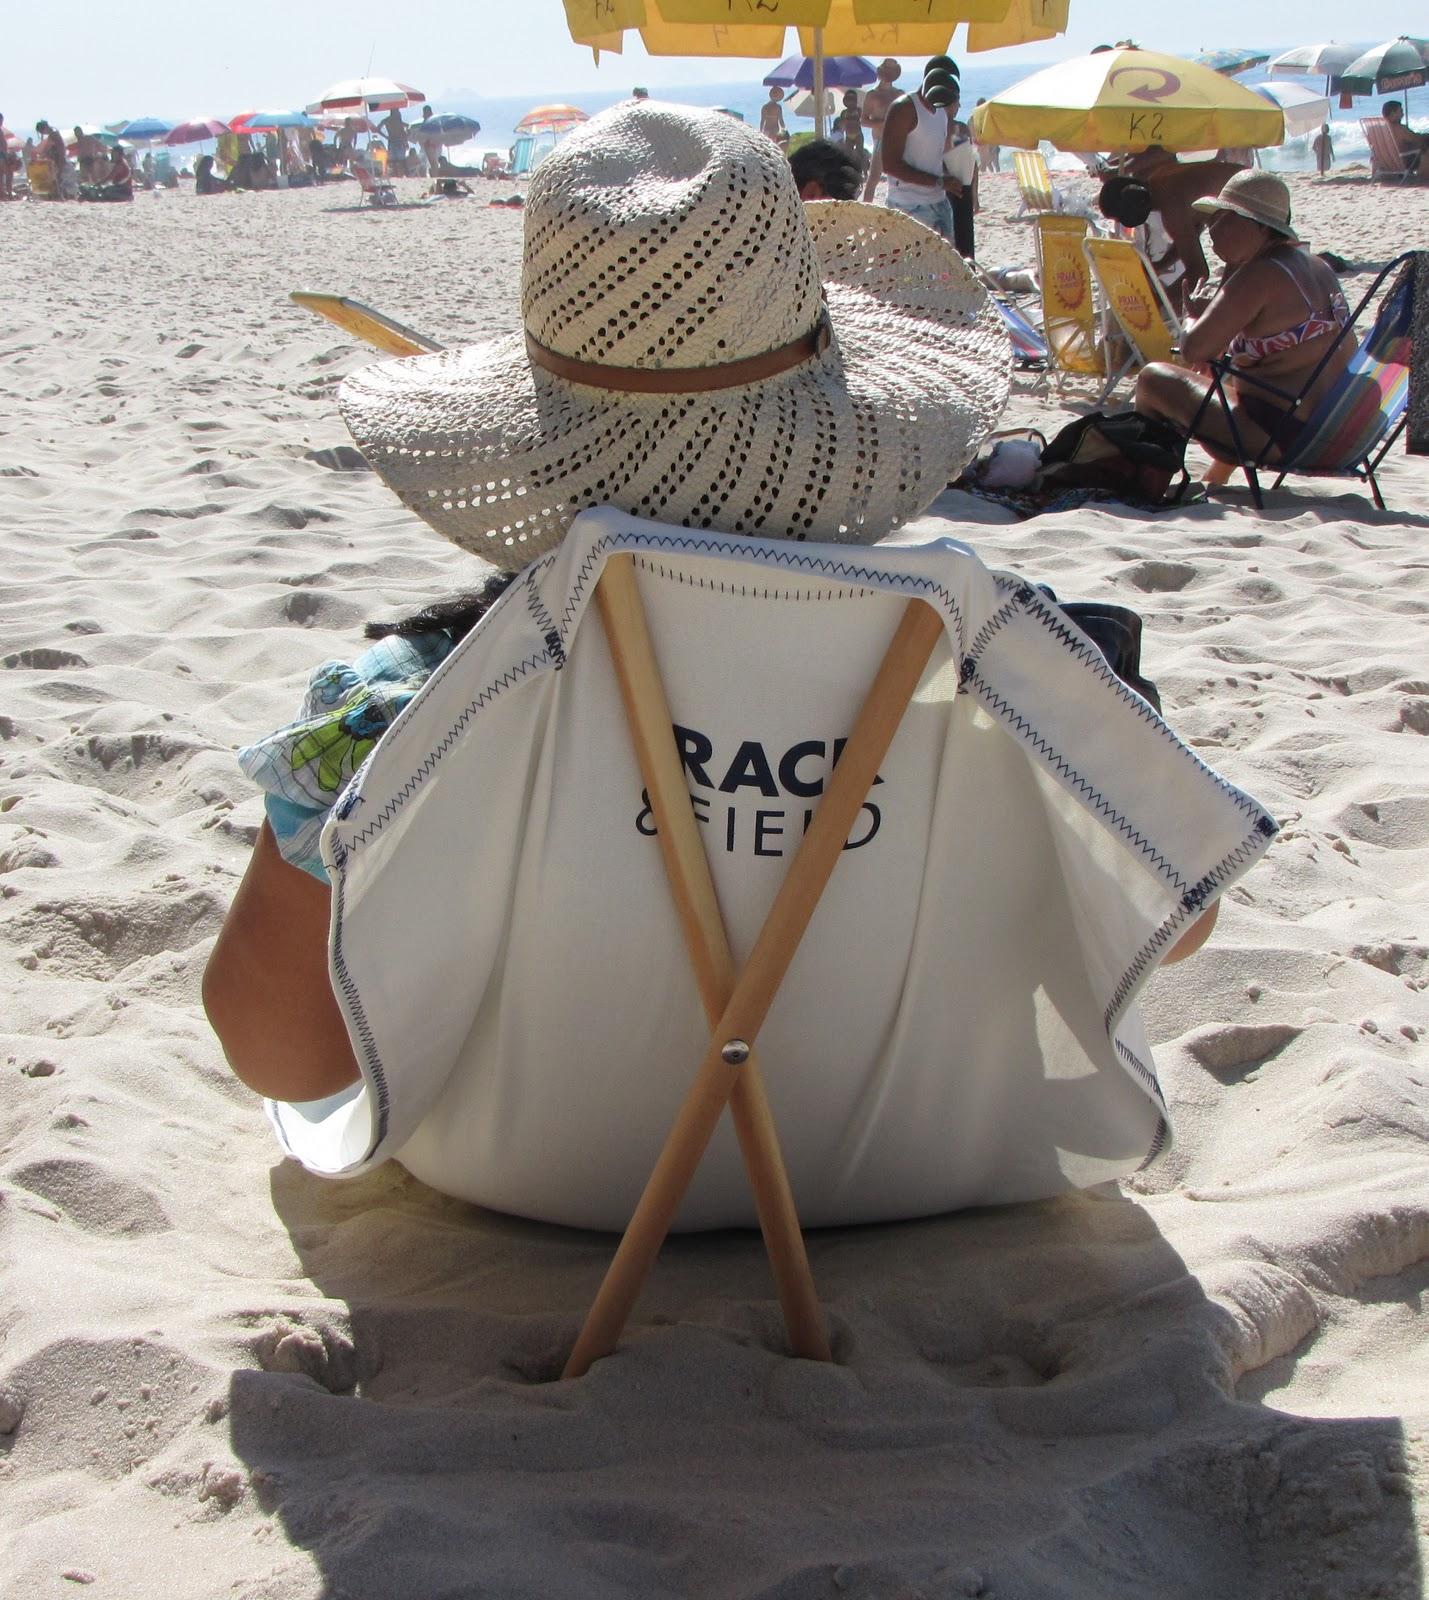 cadeira de praia de praia track field 2.jpg #997332 1429x1600